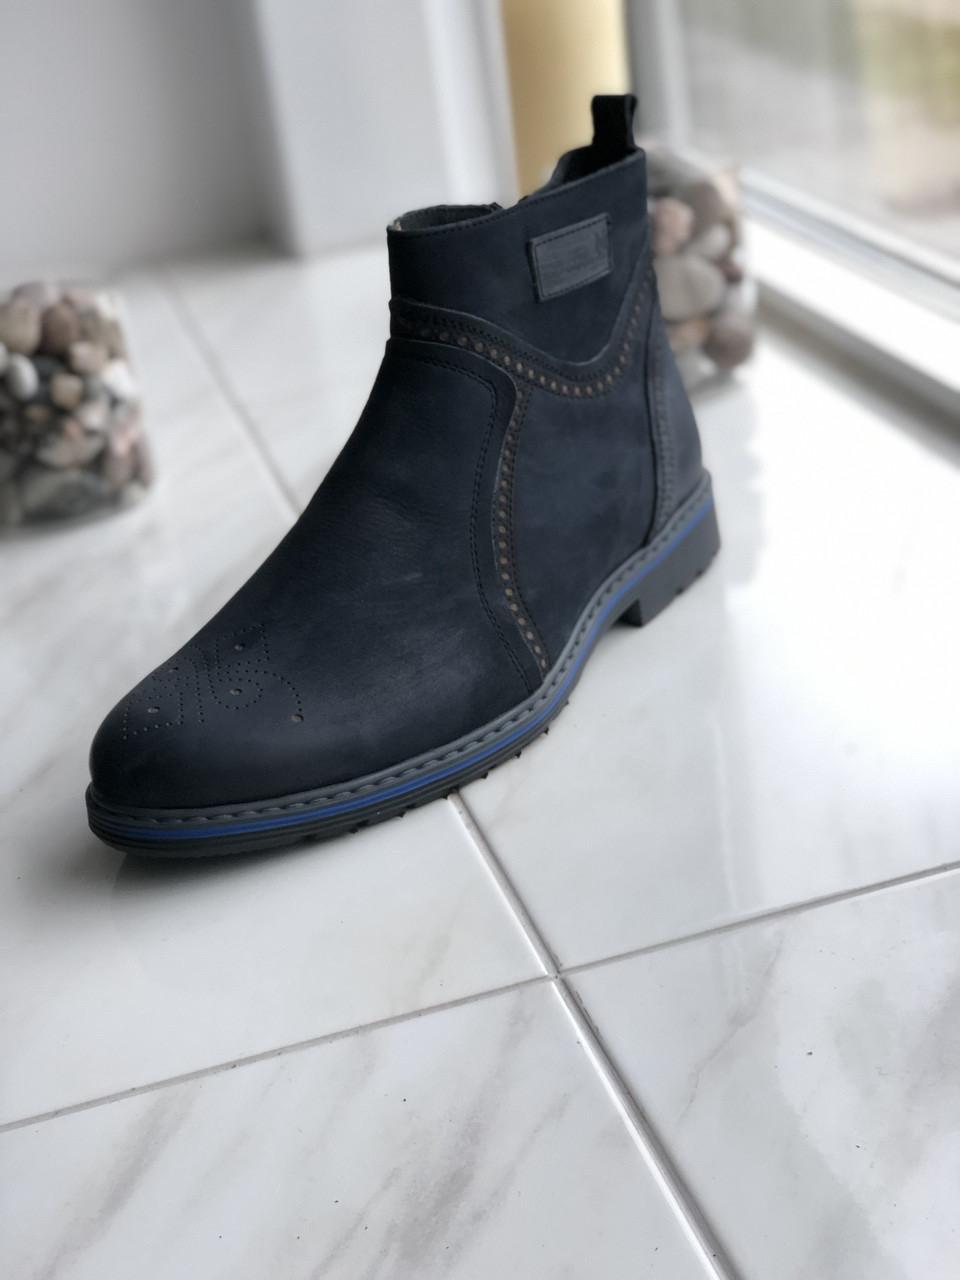 Мужские зимние ботинки кожа 43 44 р.